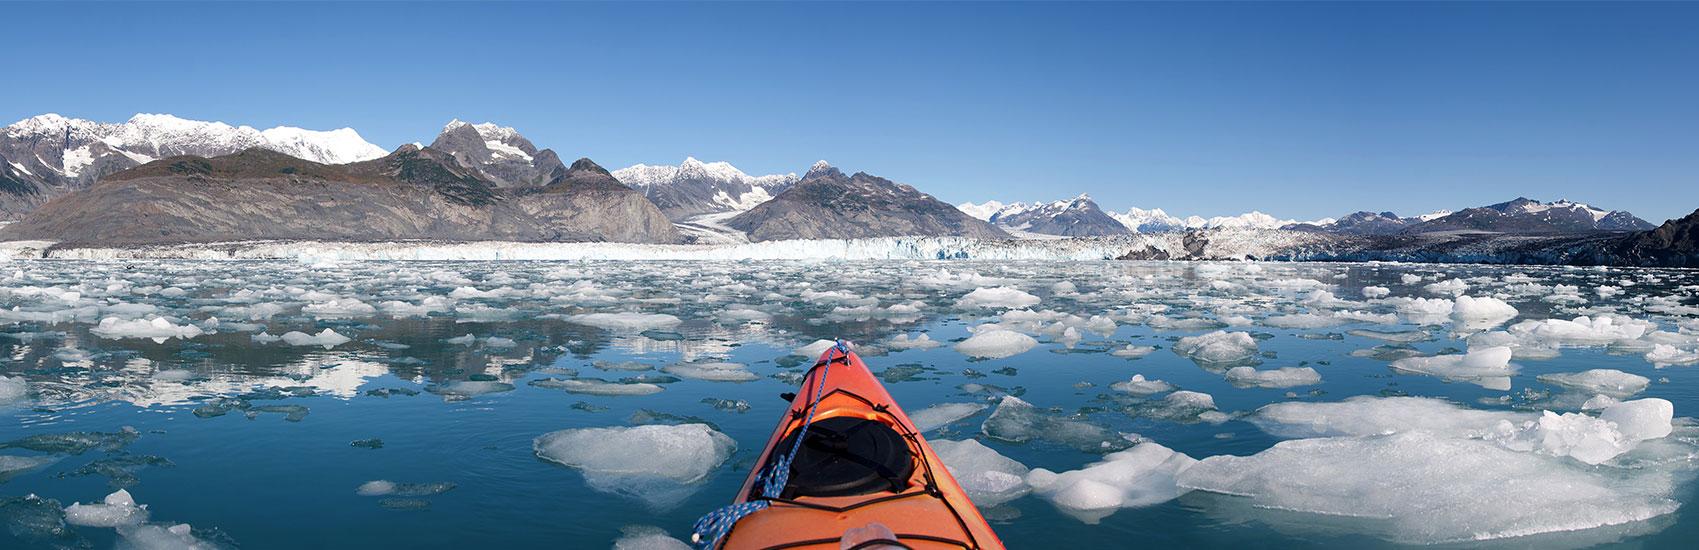 Explore Alaska with Holland America Cruise Line 2